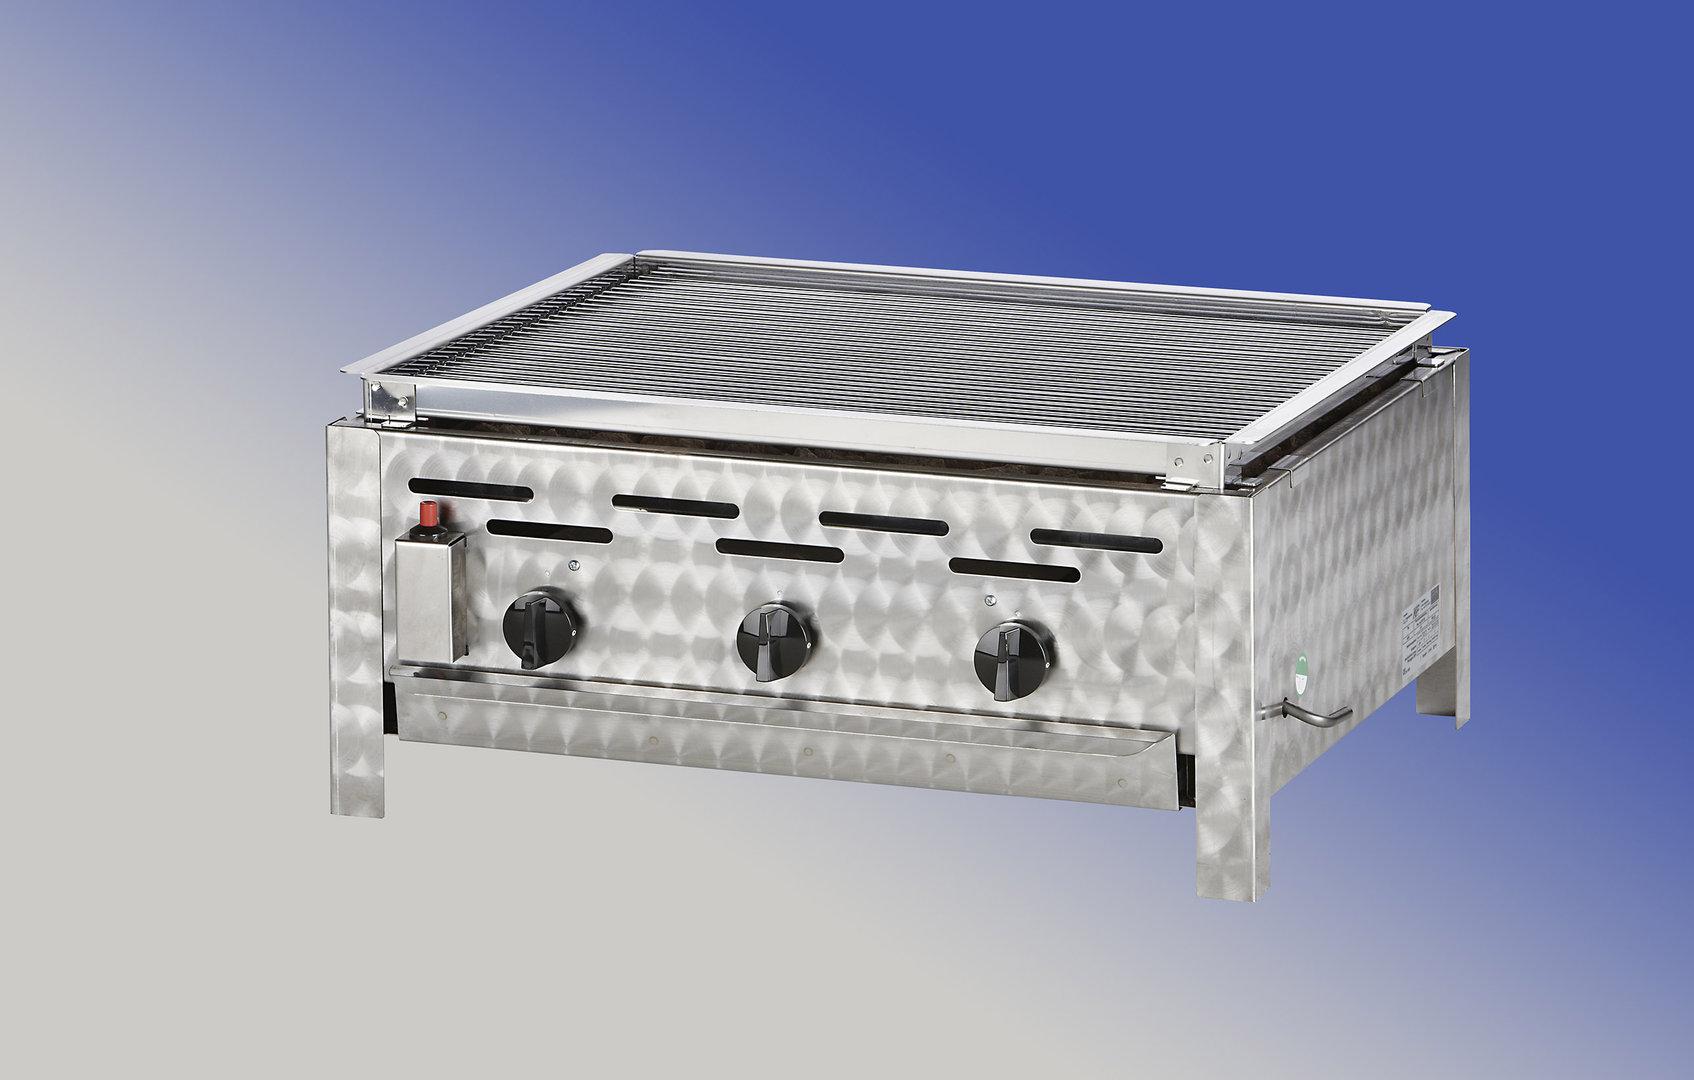 Bräter Für Gasgrill : Holzkohle u gas grill bräter